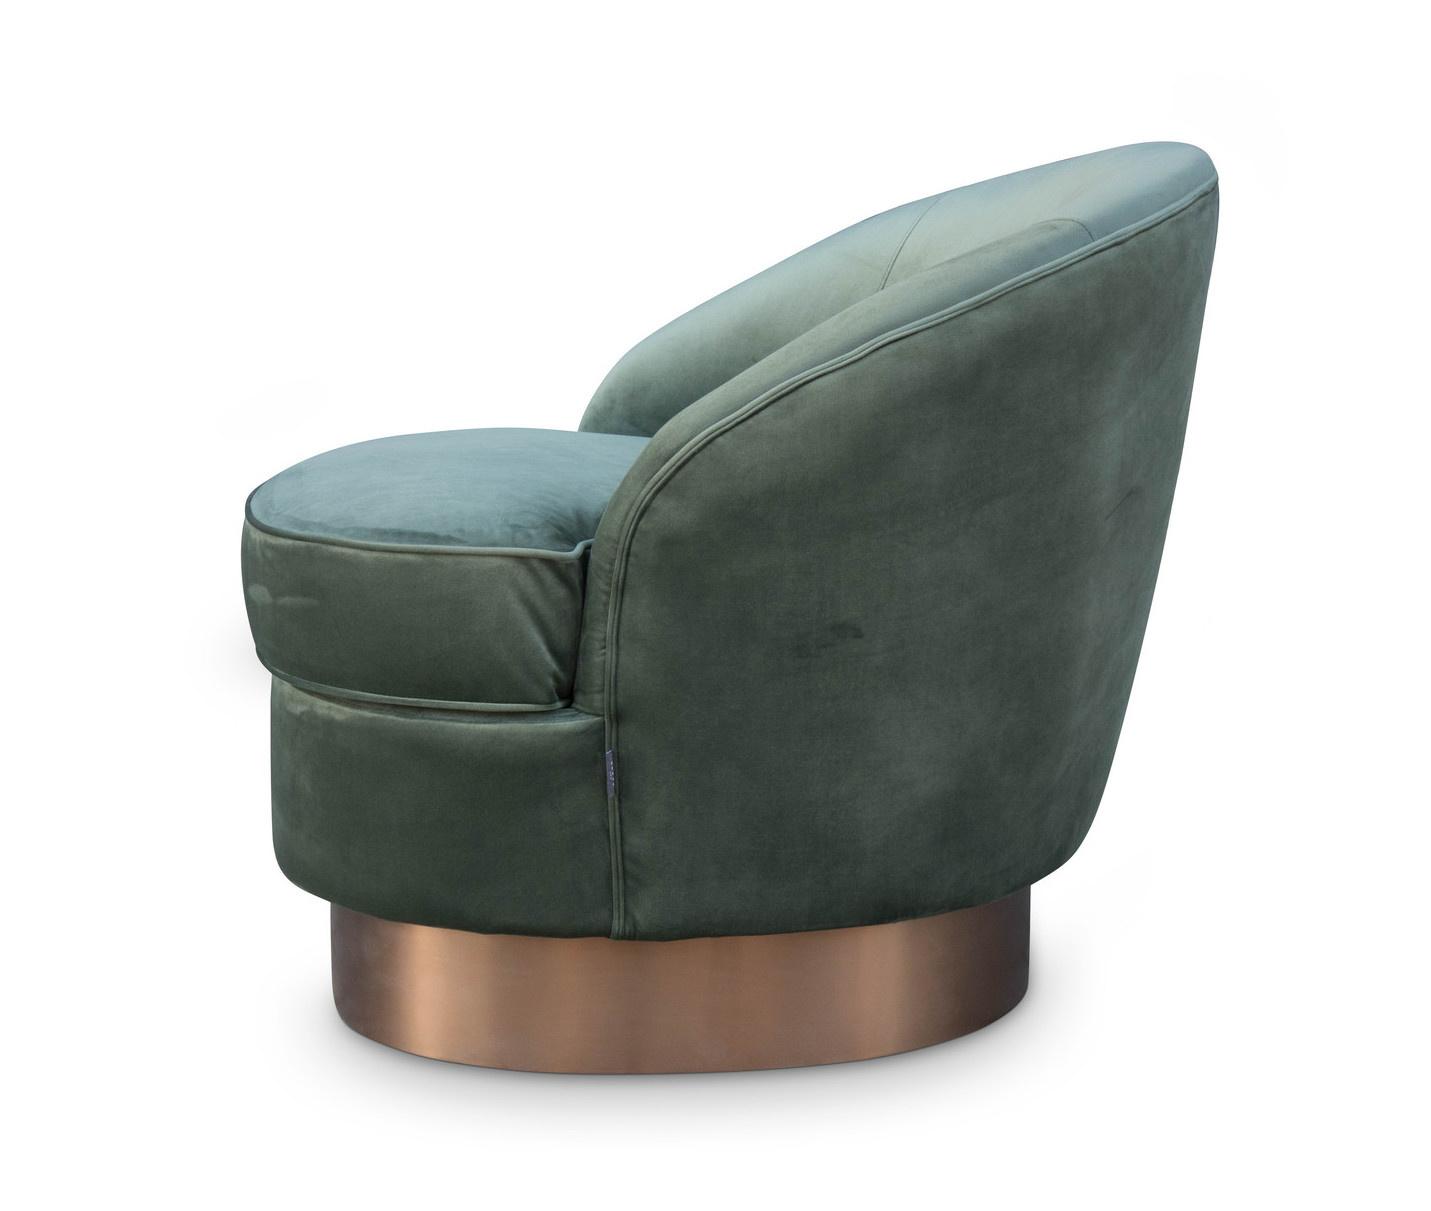 GIARDION Arm Chair Forest Green velvet-2